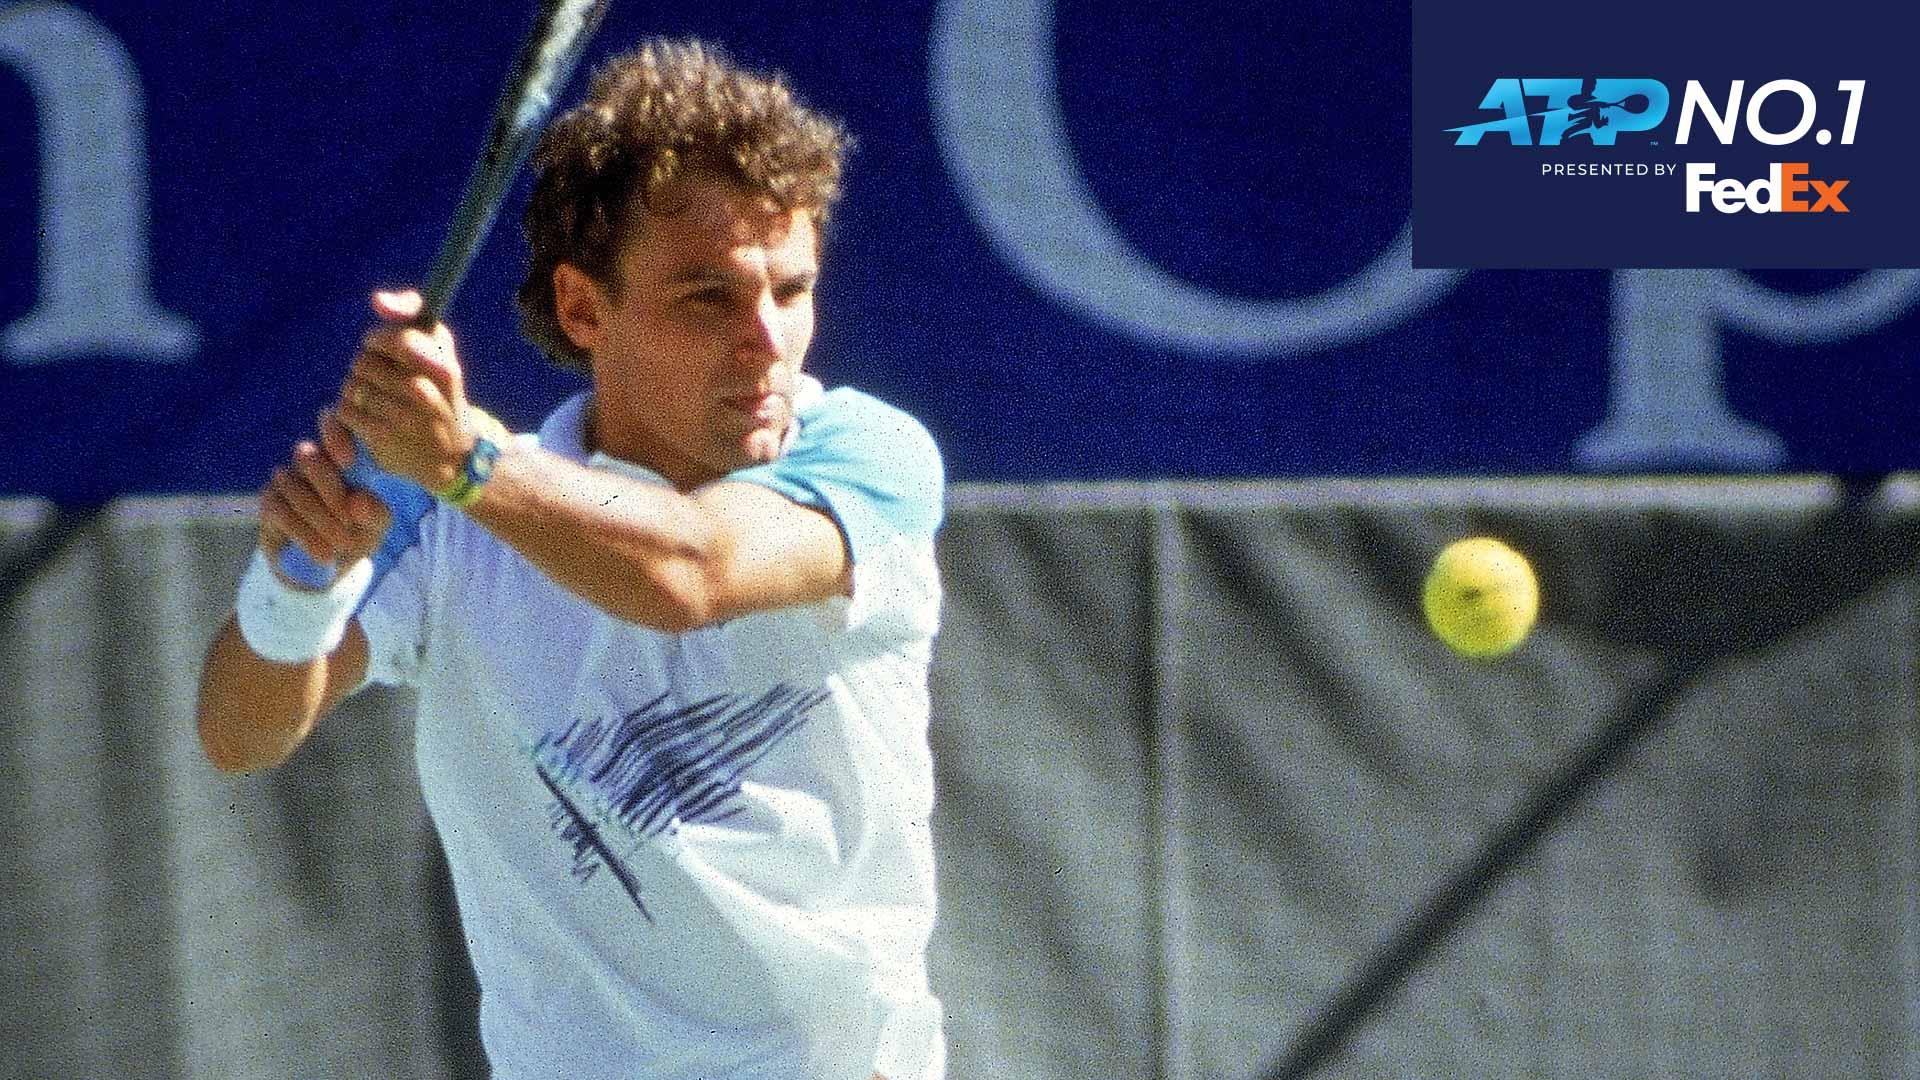 Atp Heritage Mats Wilander At No 1 In Fedex Atp Rankings Atp Tour Tennis